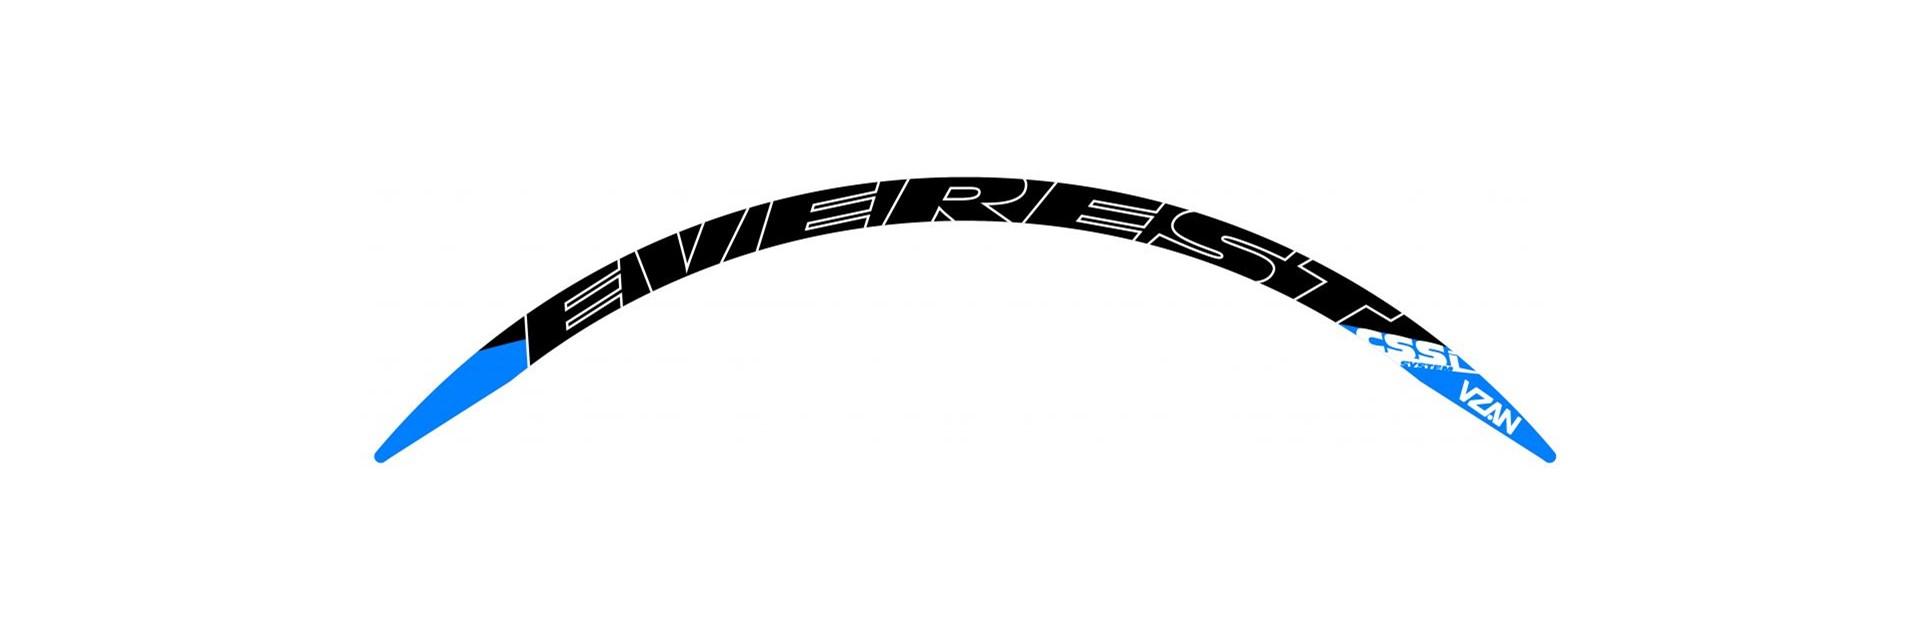 Adesivo Roda Everest Cssi